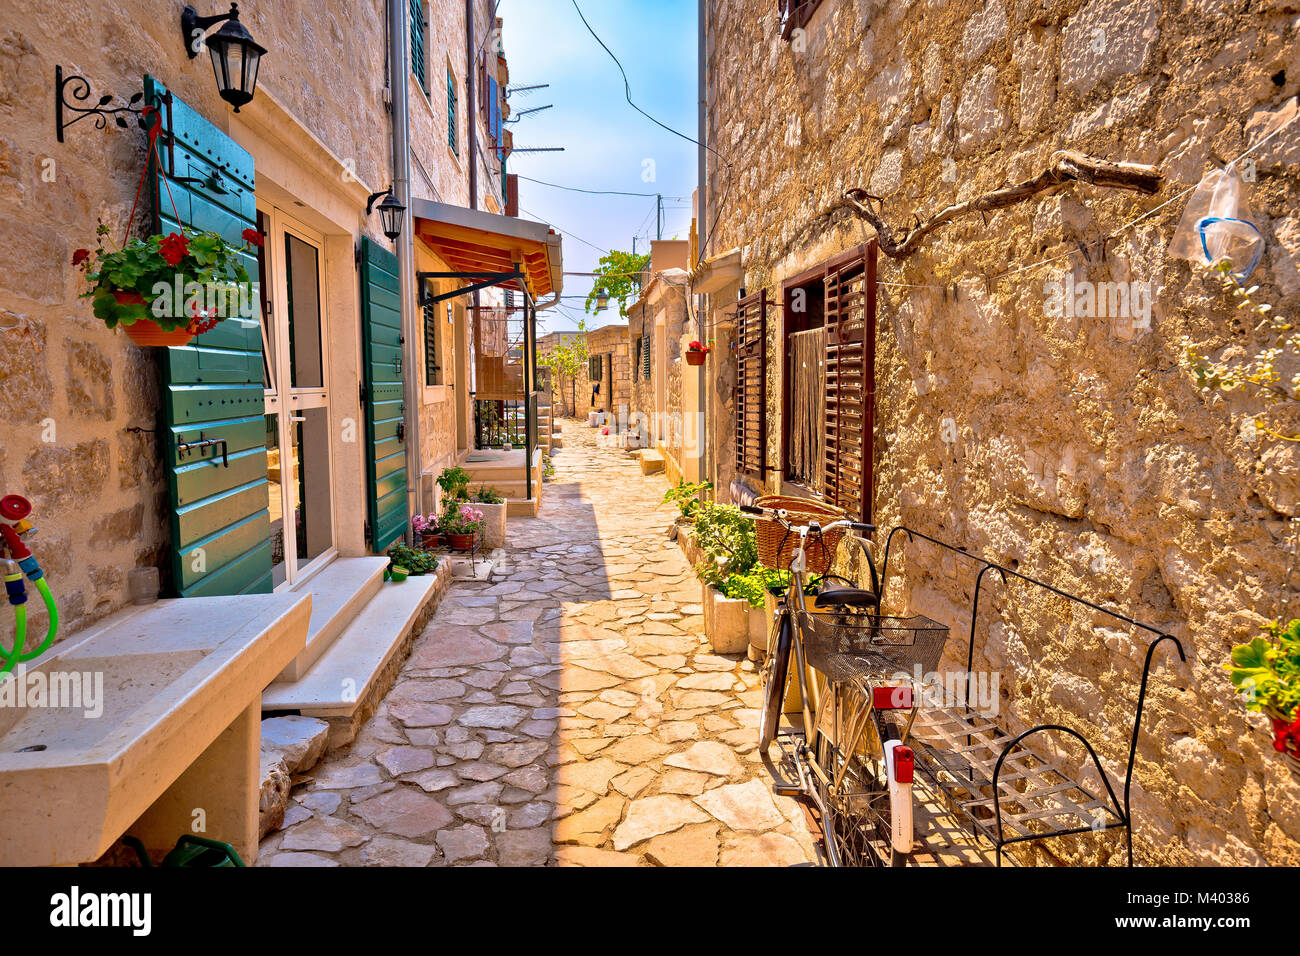 Colorful mediterranean stone street of Prvic island, Sibenik archipelago of Croatia - Stock Image